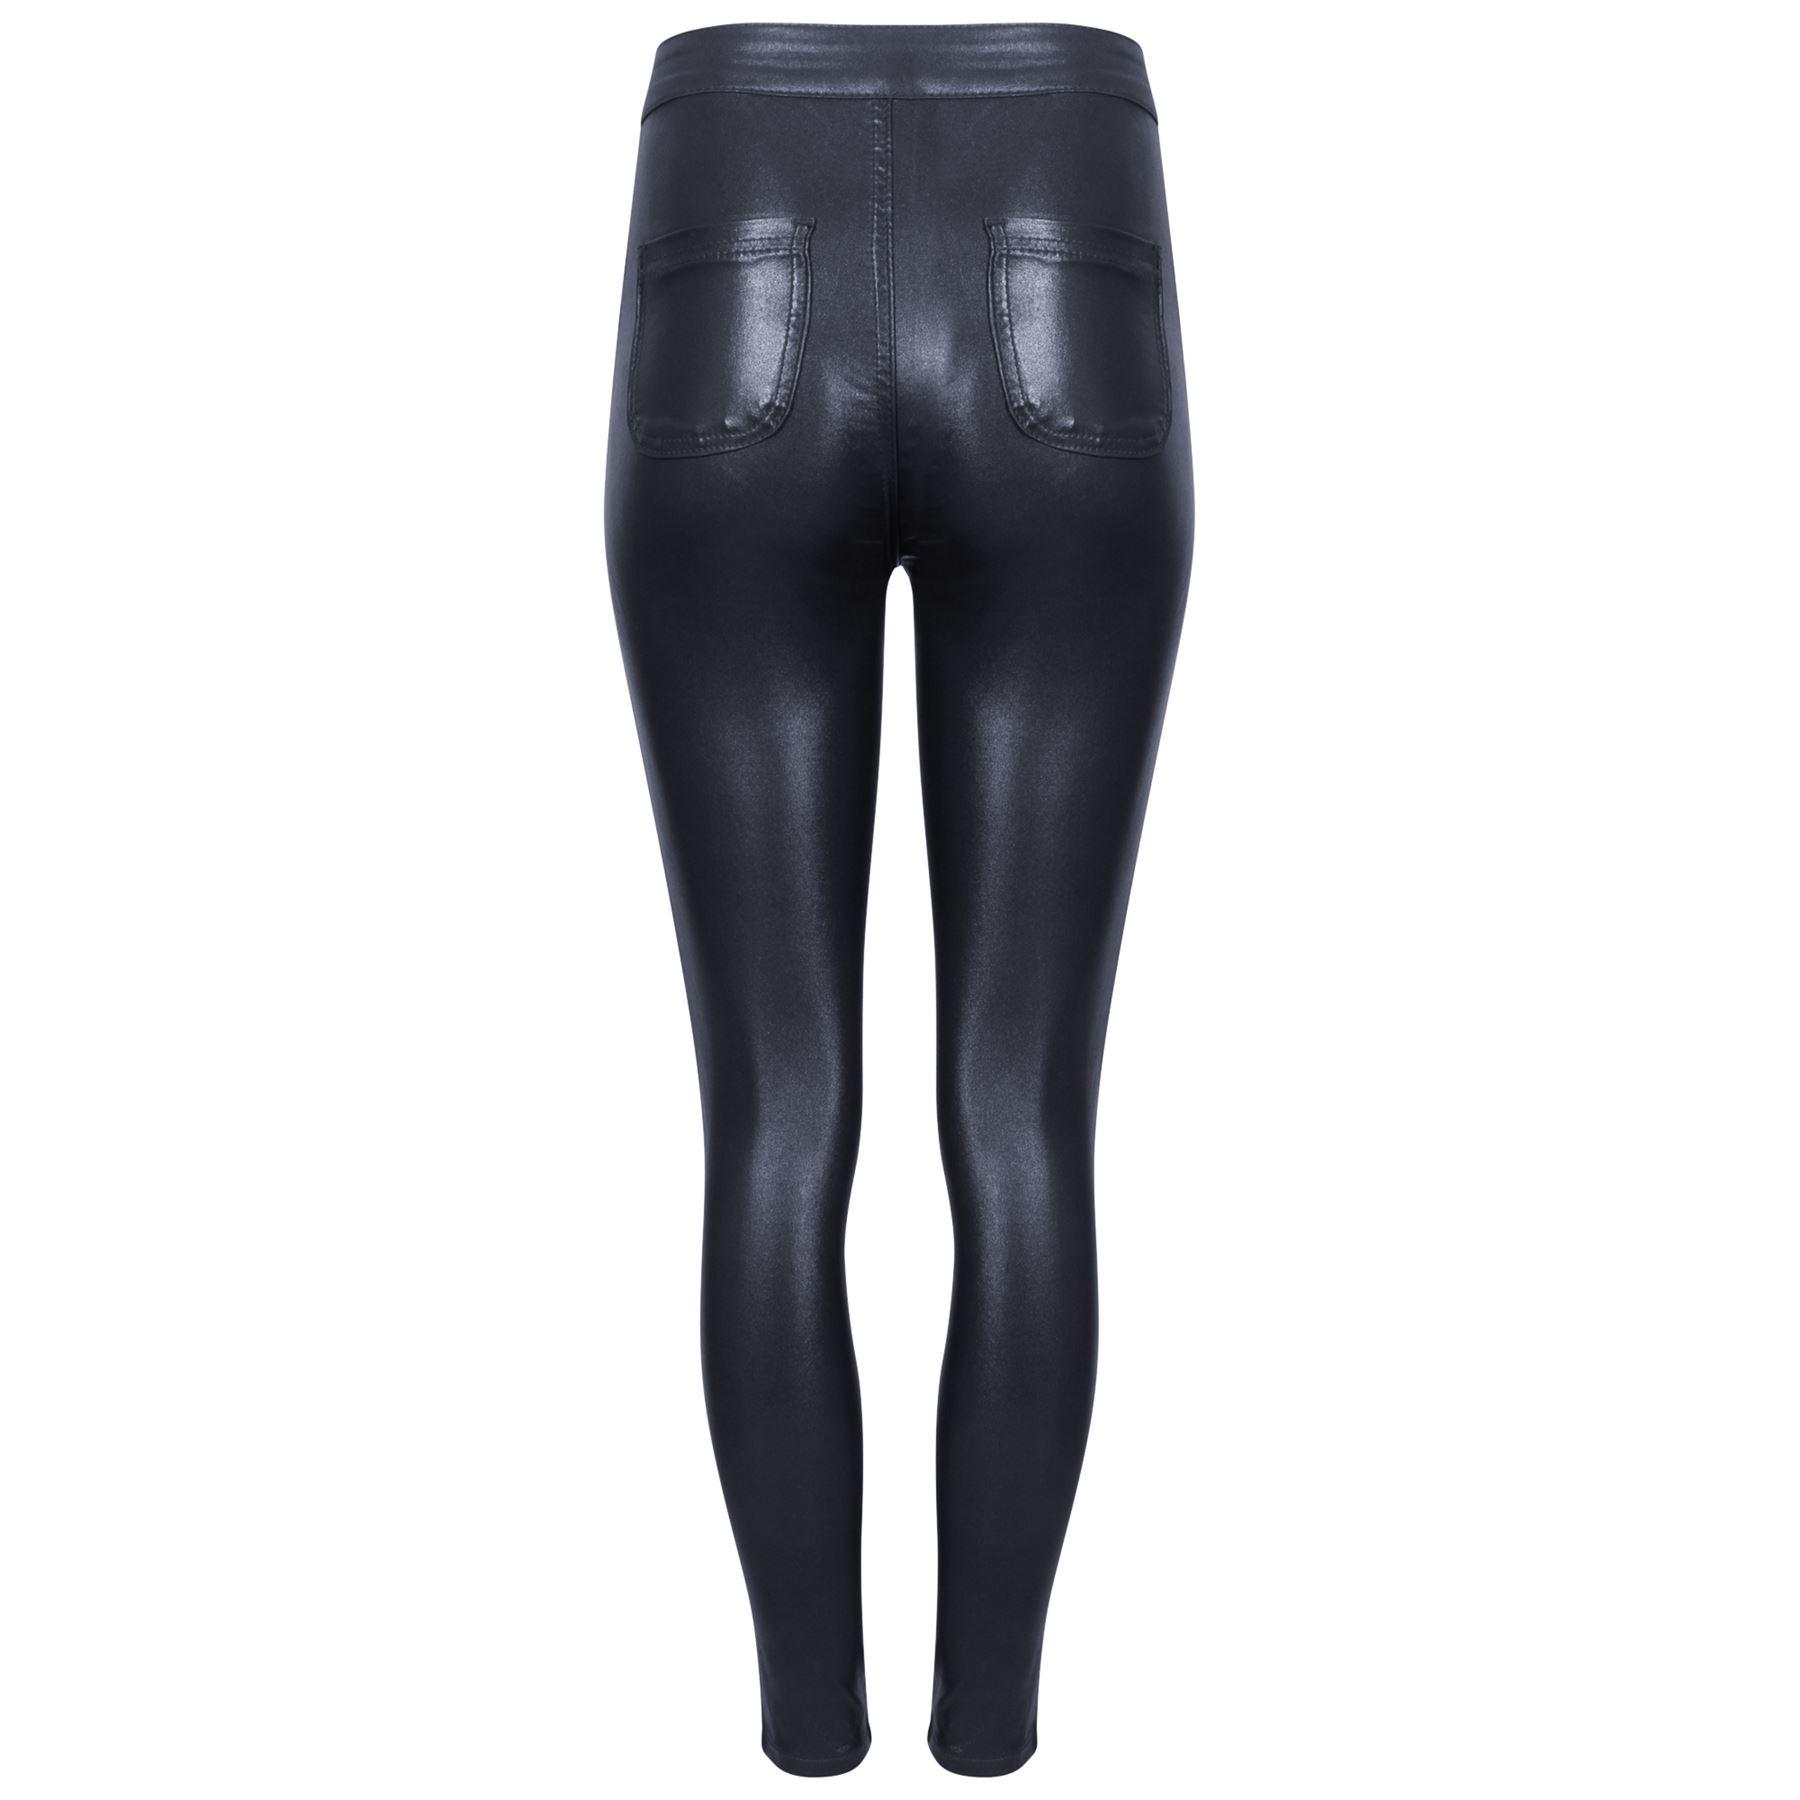 Popular WomensWetLookPULeatherStretchSkinnySexyJeansTrousersPants